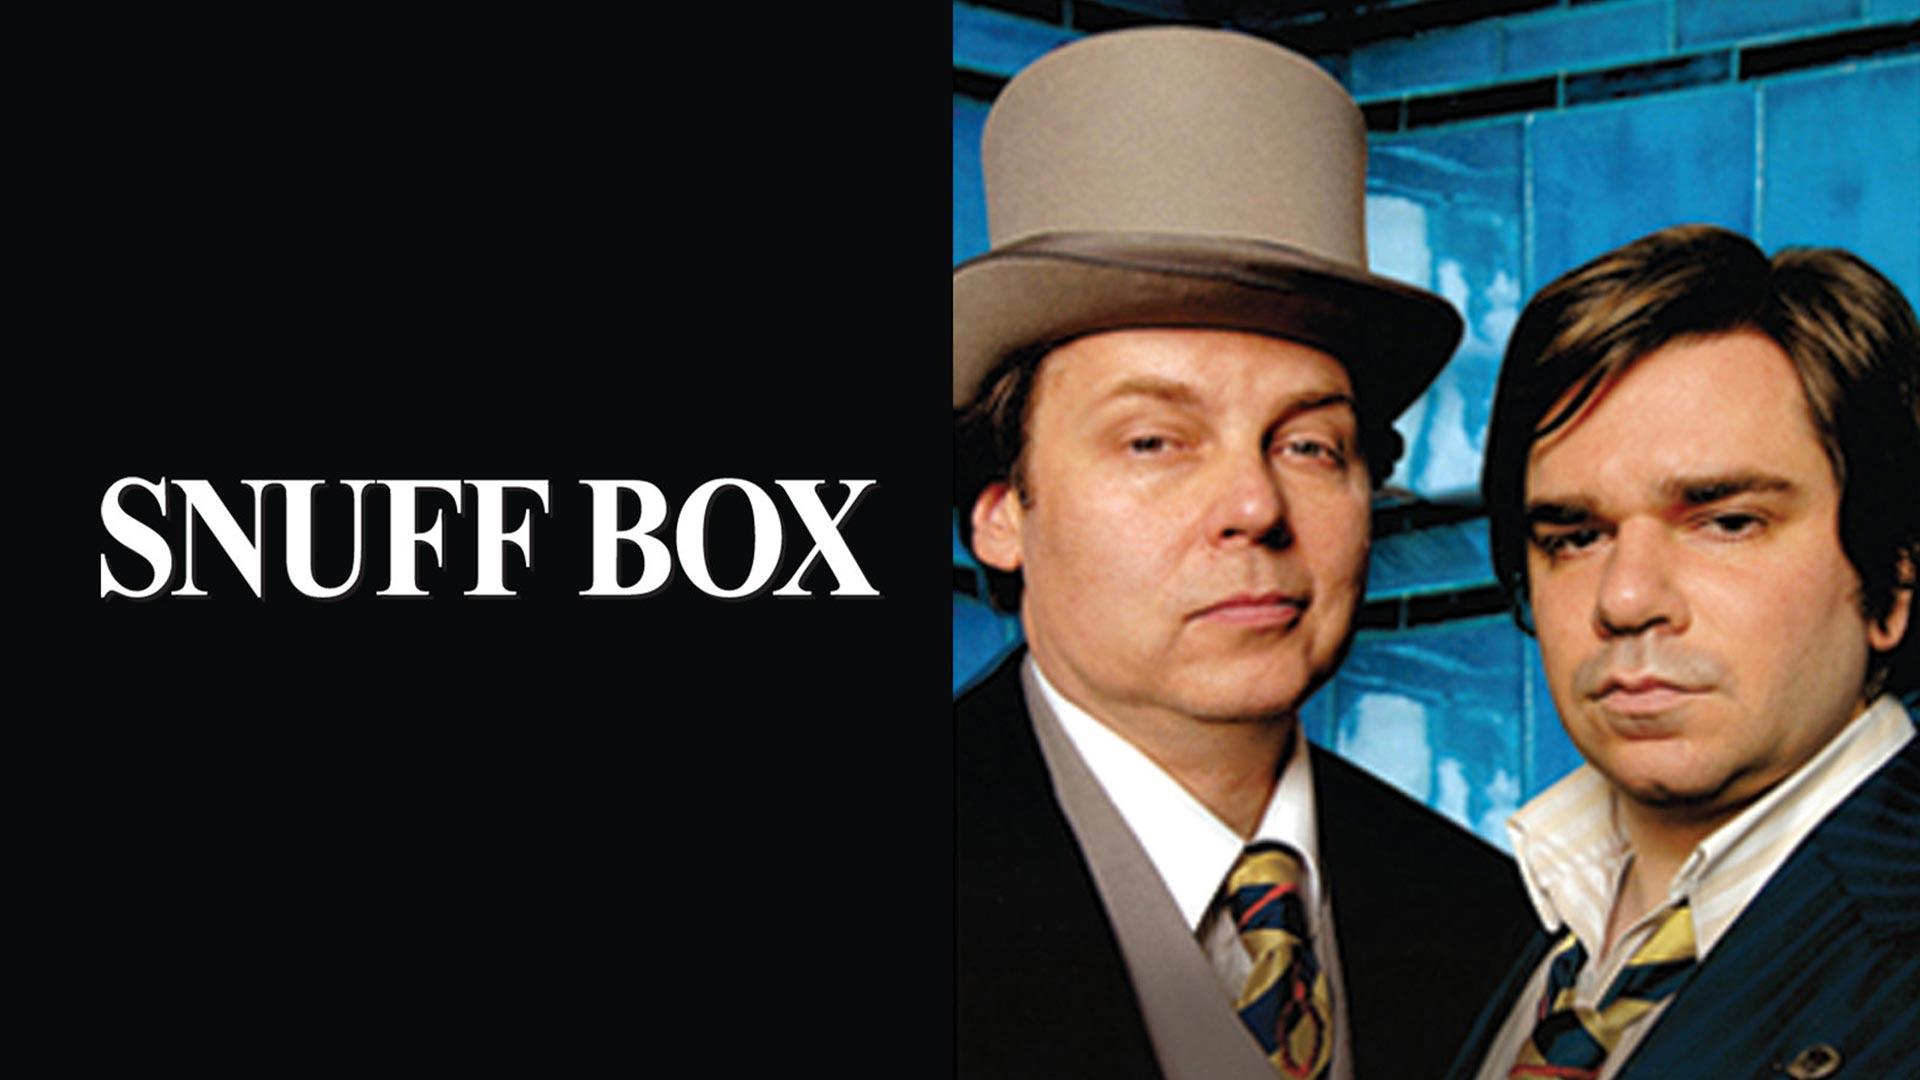 Snuff Box Season 1